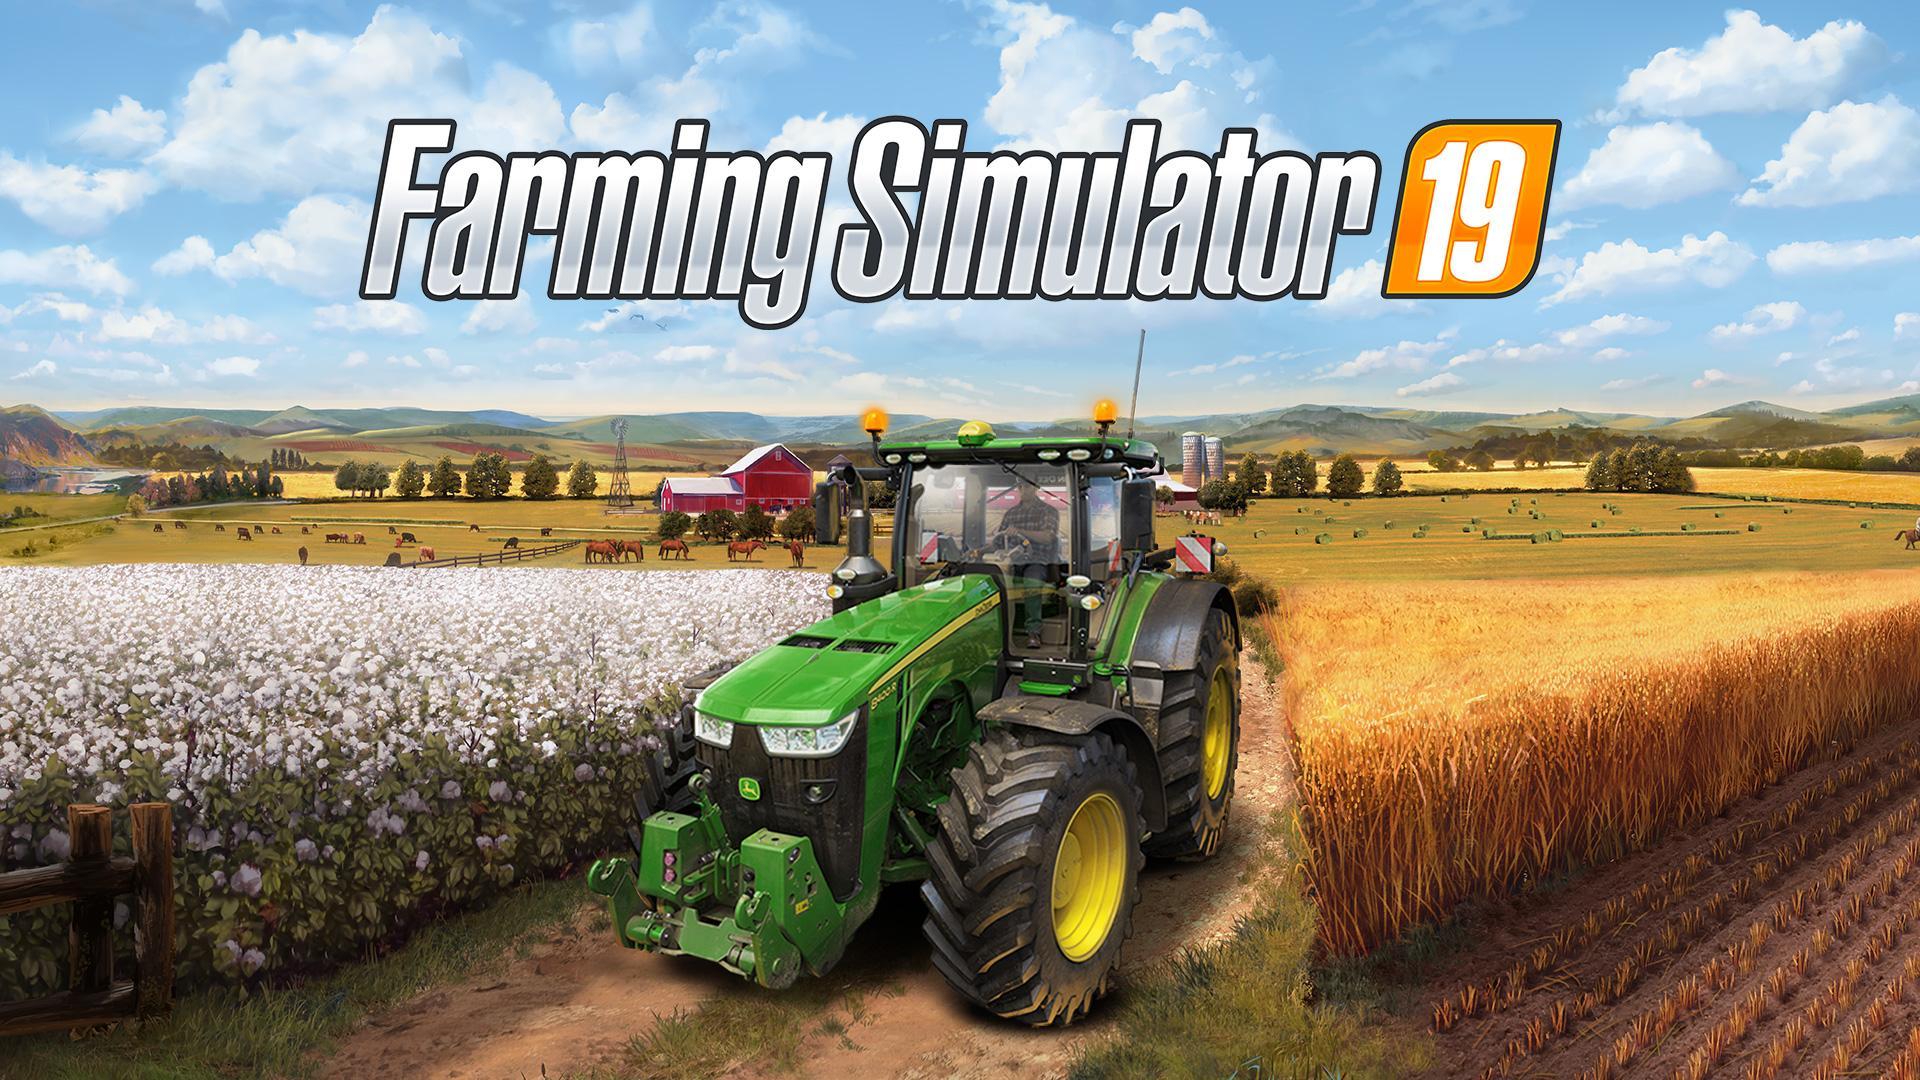 Farming Simulator Wallpapers   Top Farming Simulator 1920x1080